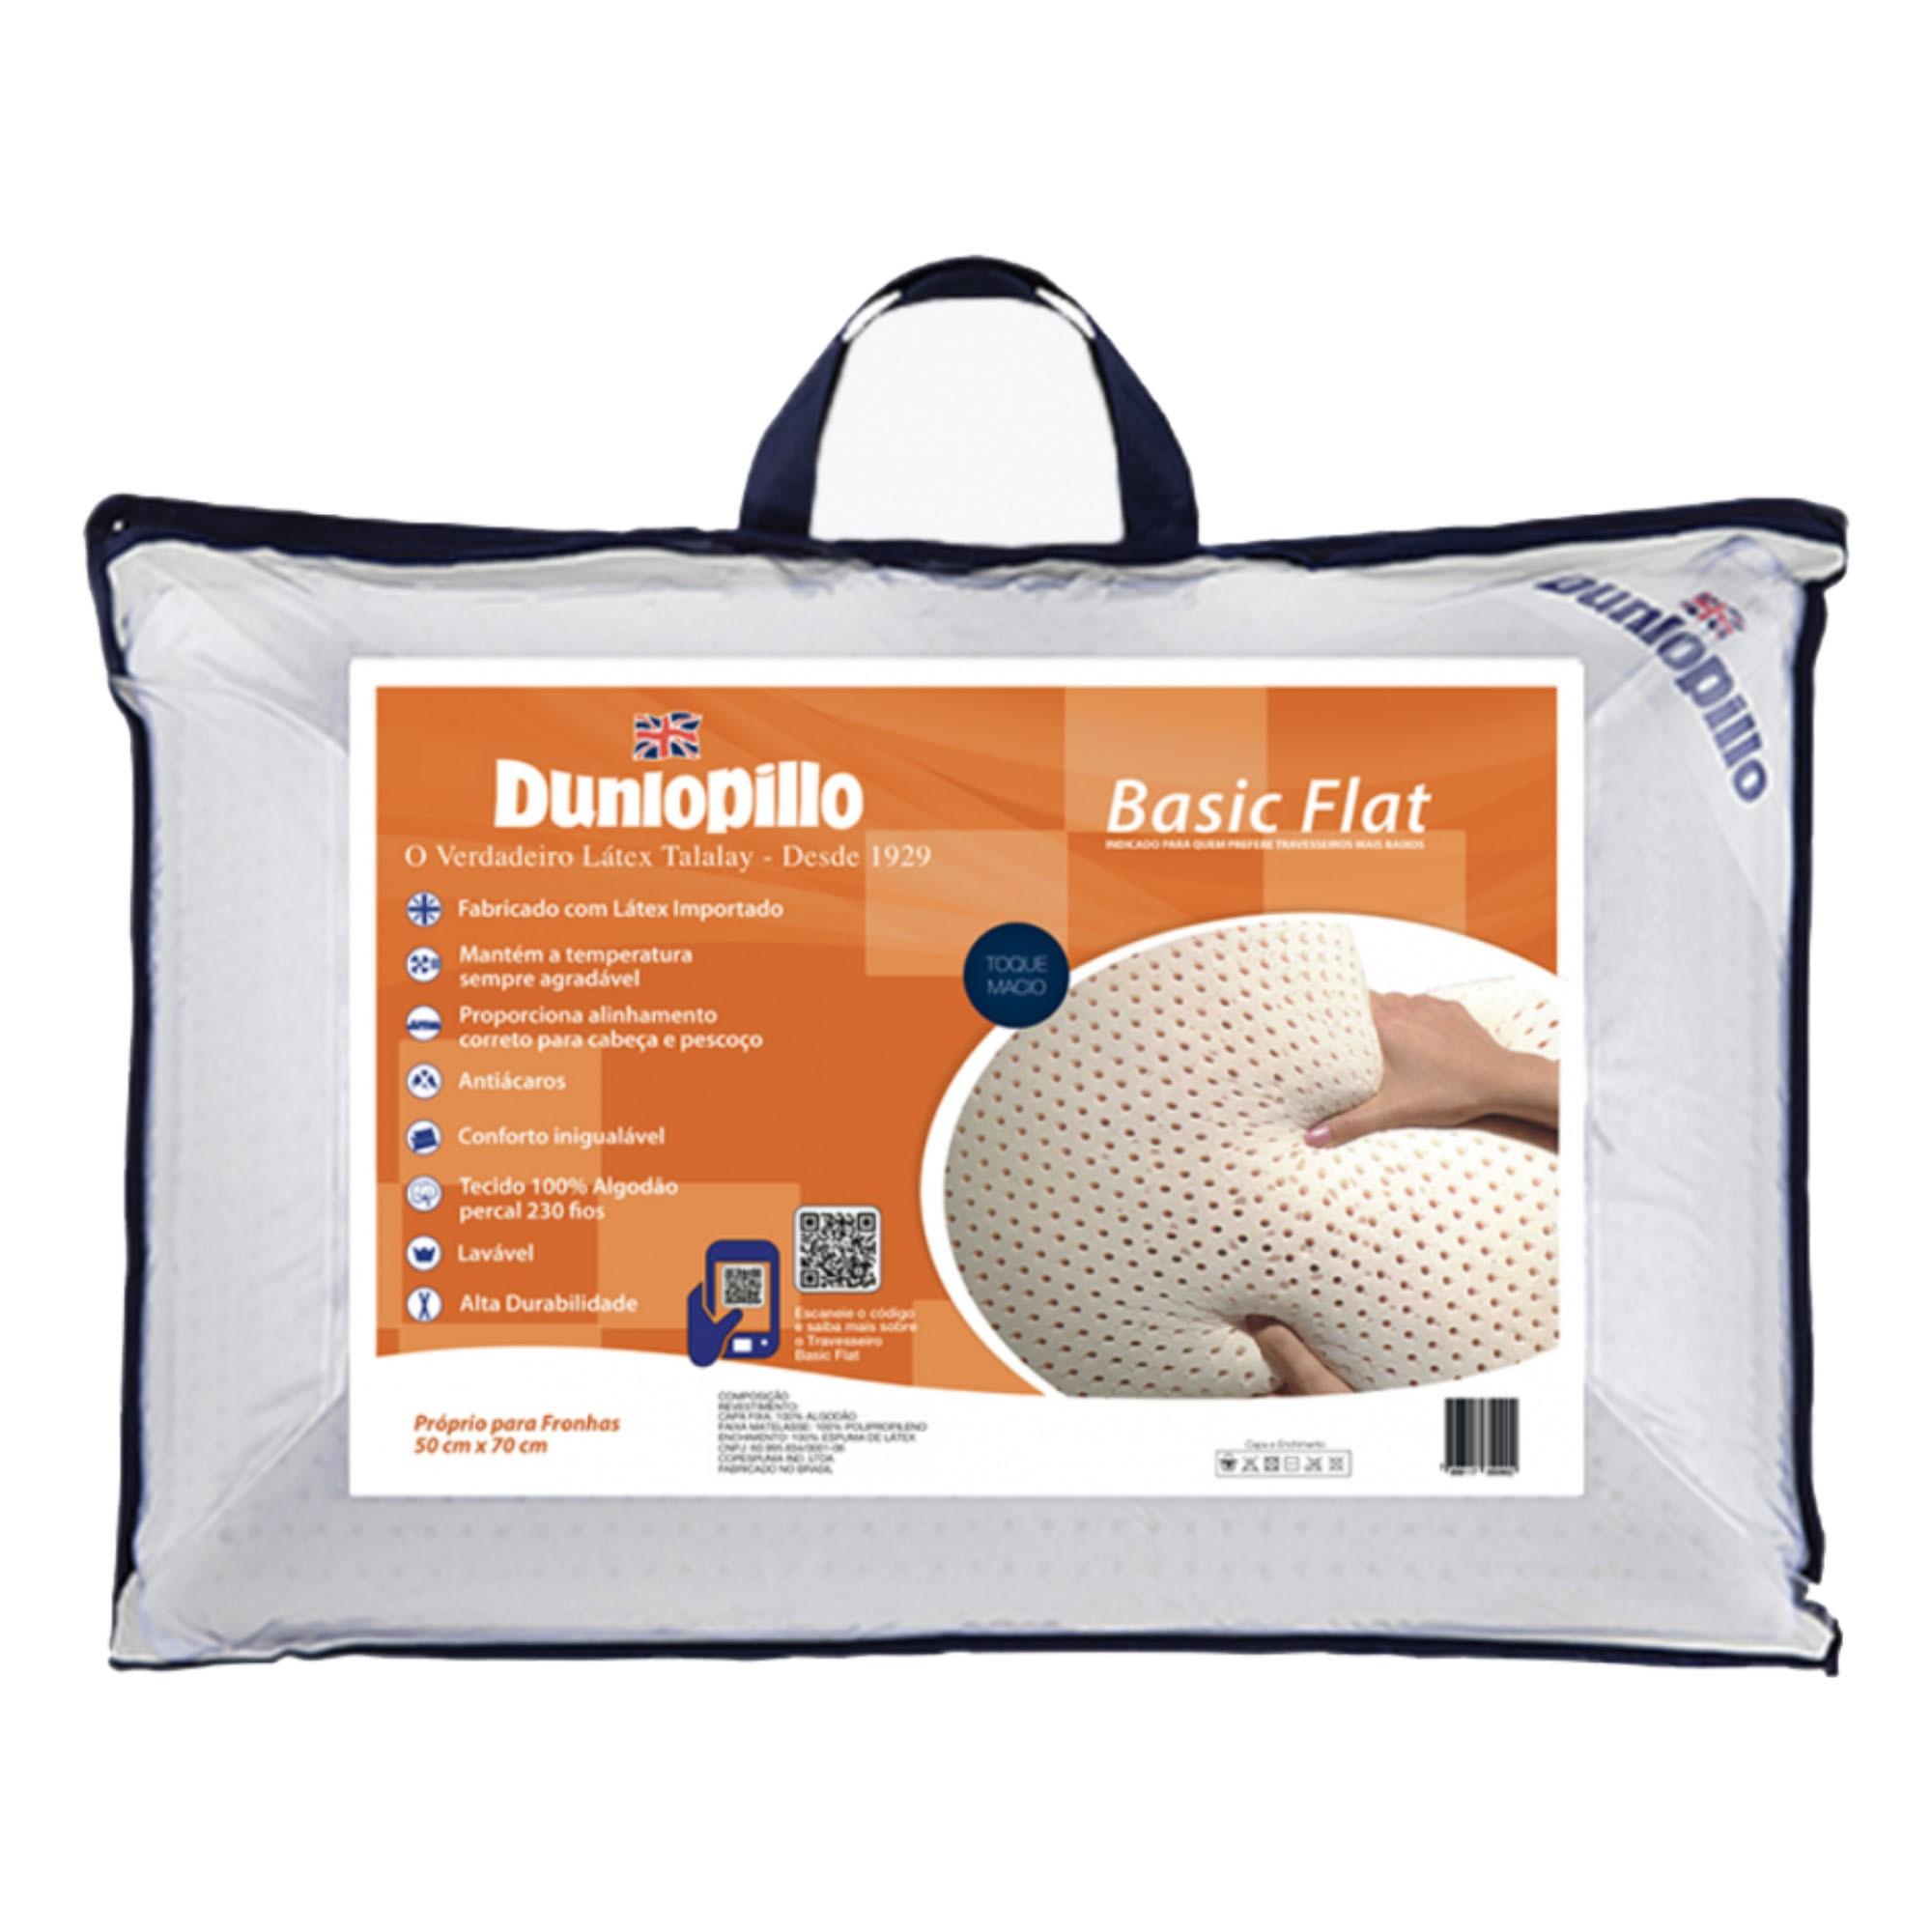 Travesseiro Dunlopillo Basic Flat, 100% Látex, Intermediário, 050 x 070 cm